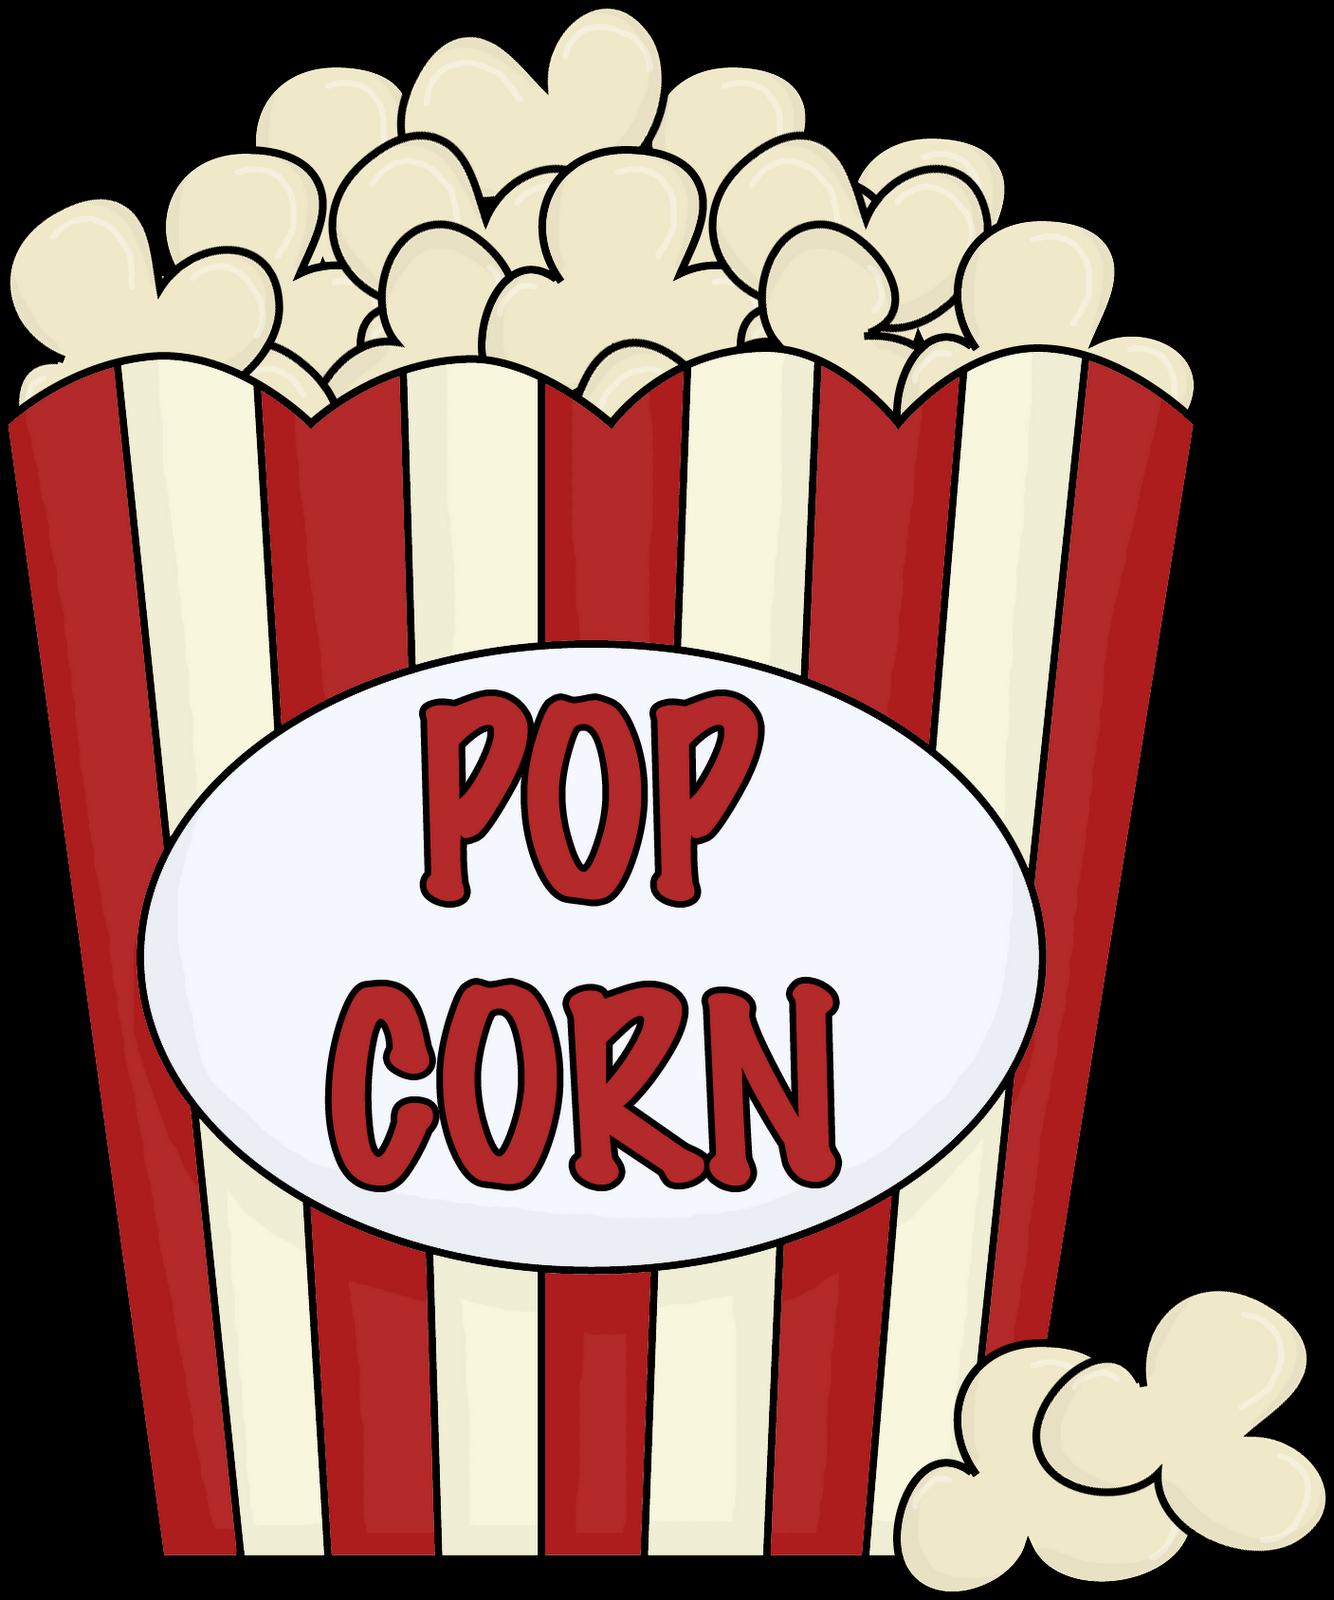 Clipart free popcorn. Clip art black and